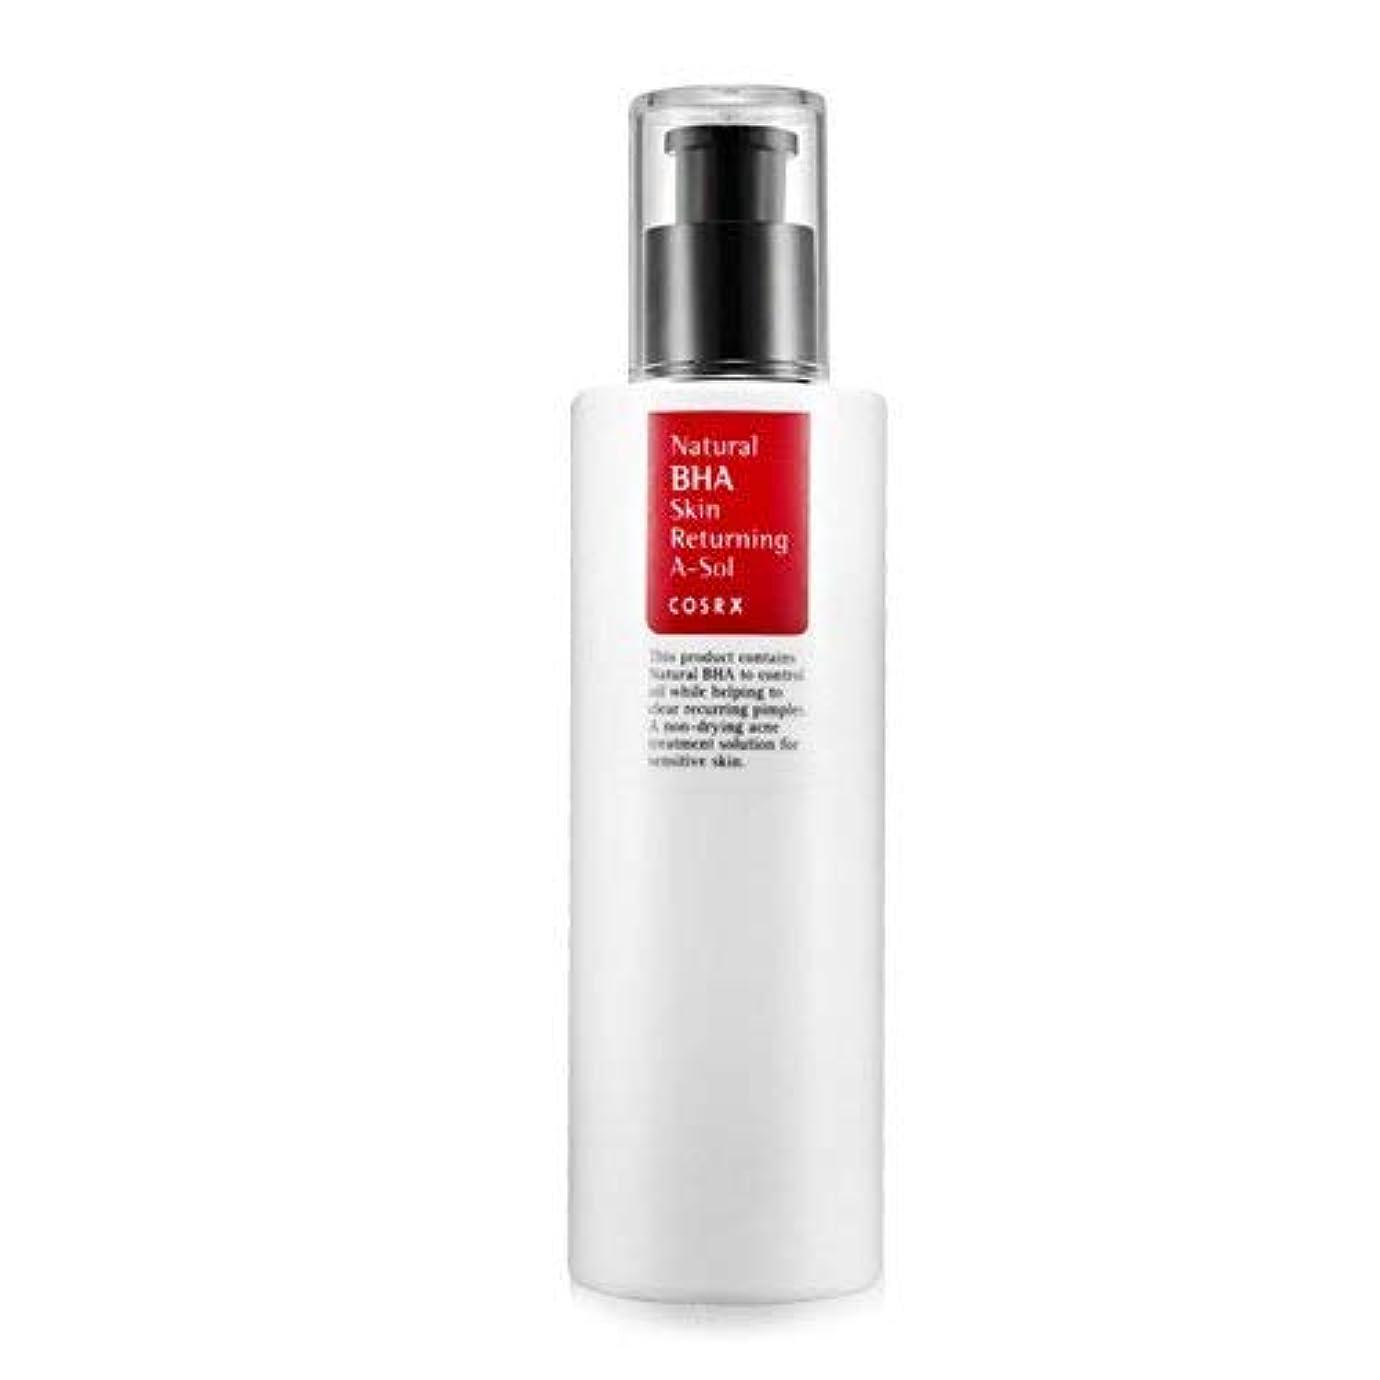 COSRX ナチュラル BHA スキン リータニング A-sol /Natural BHA Skin Returning A-sol(100ml*6 Pack)